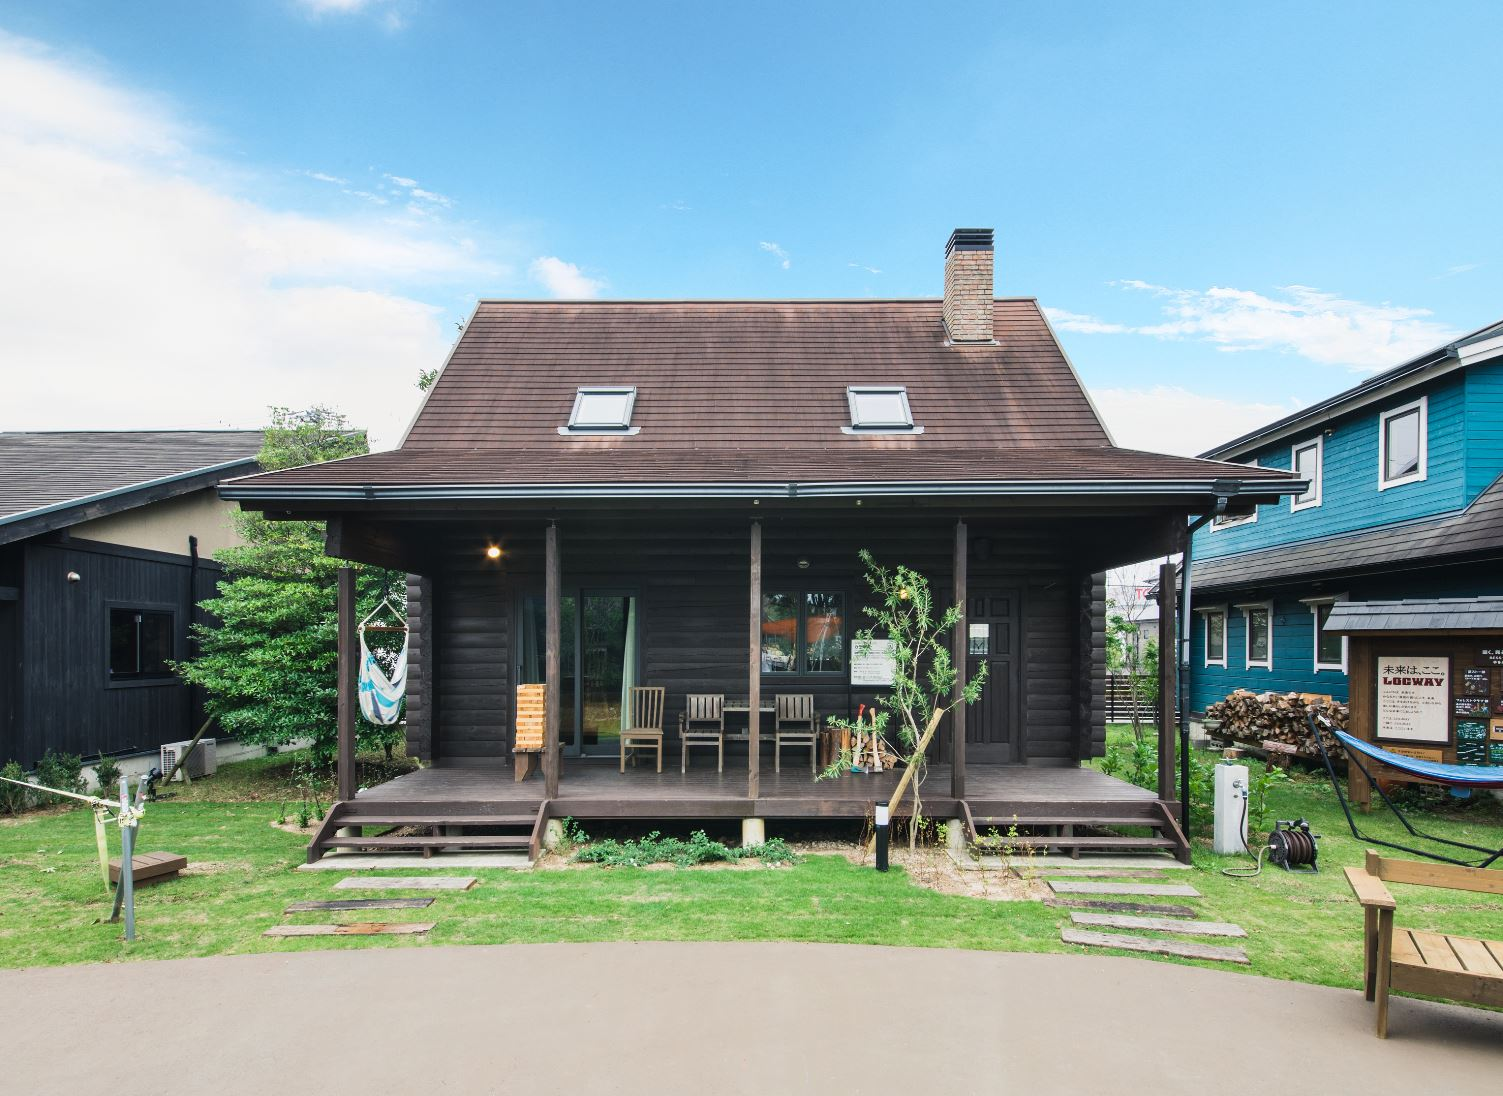 BESS浜松【浜松市西区志都呂1-22-19・モデルハウス】三角屋根から煙突が飛び出し、ウッドデッキが広がる姿が絵になる